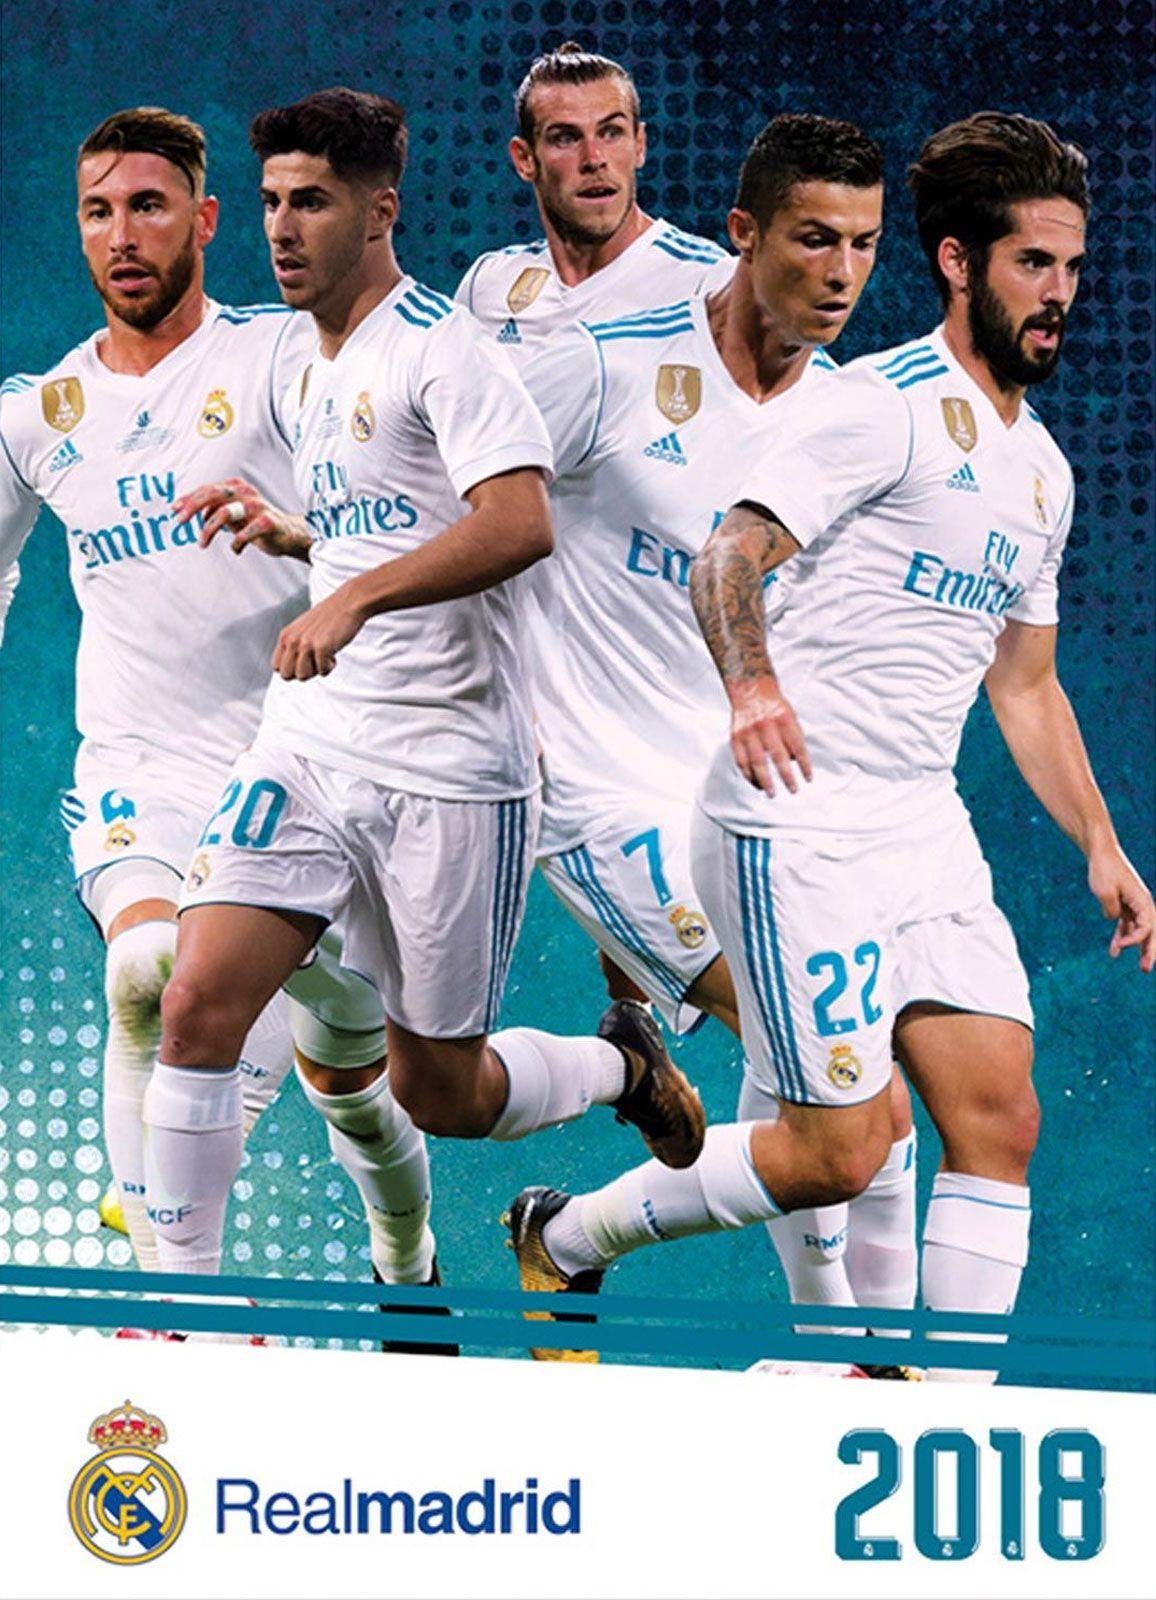 cf71b7dc3d67f Real Madrid - kalendarz 2018